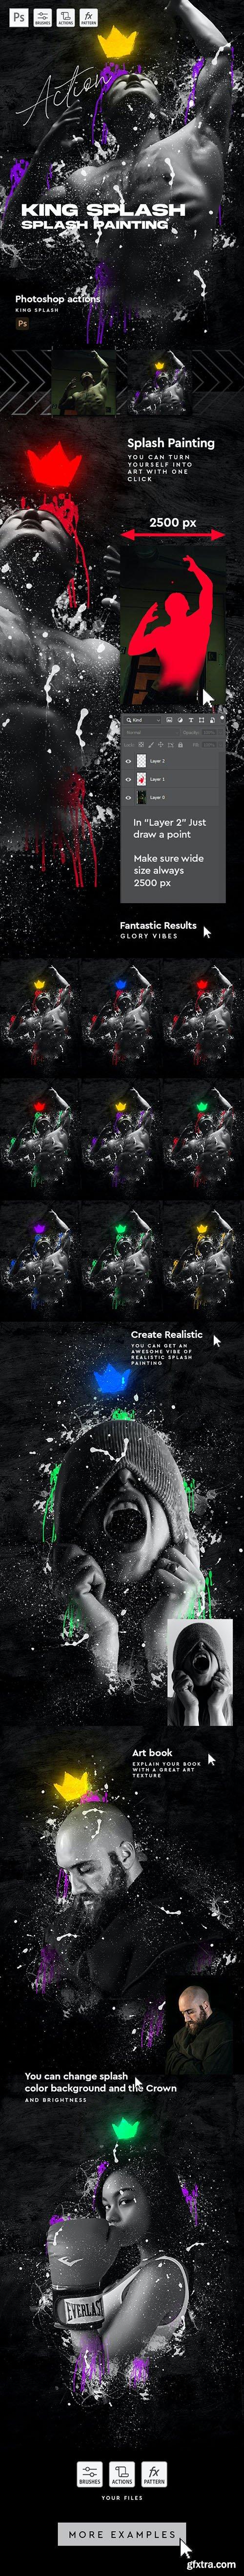 GraphicRiver - King Splash Painting Photoshop Action 30455842